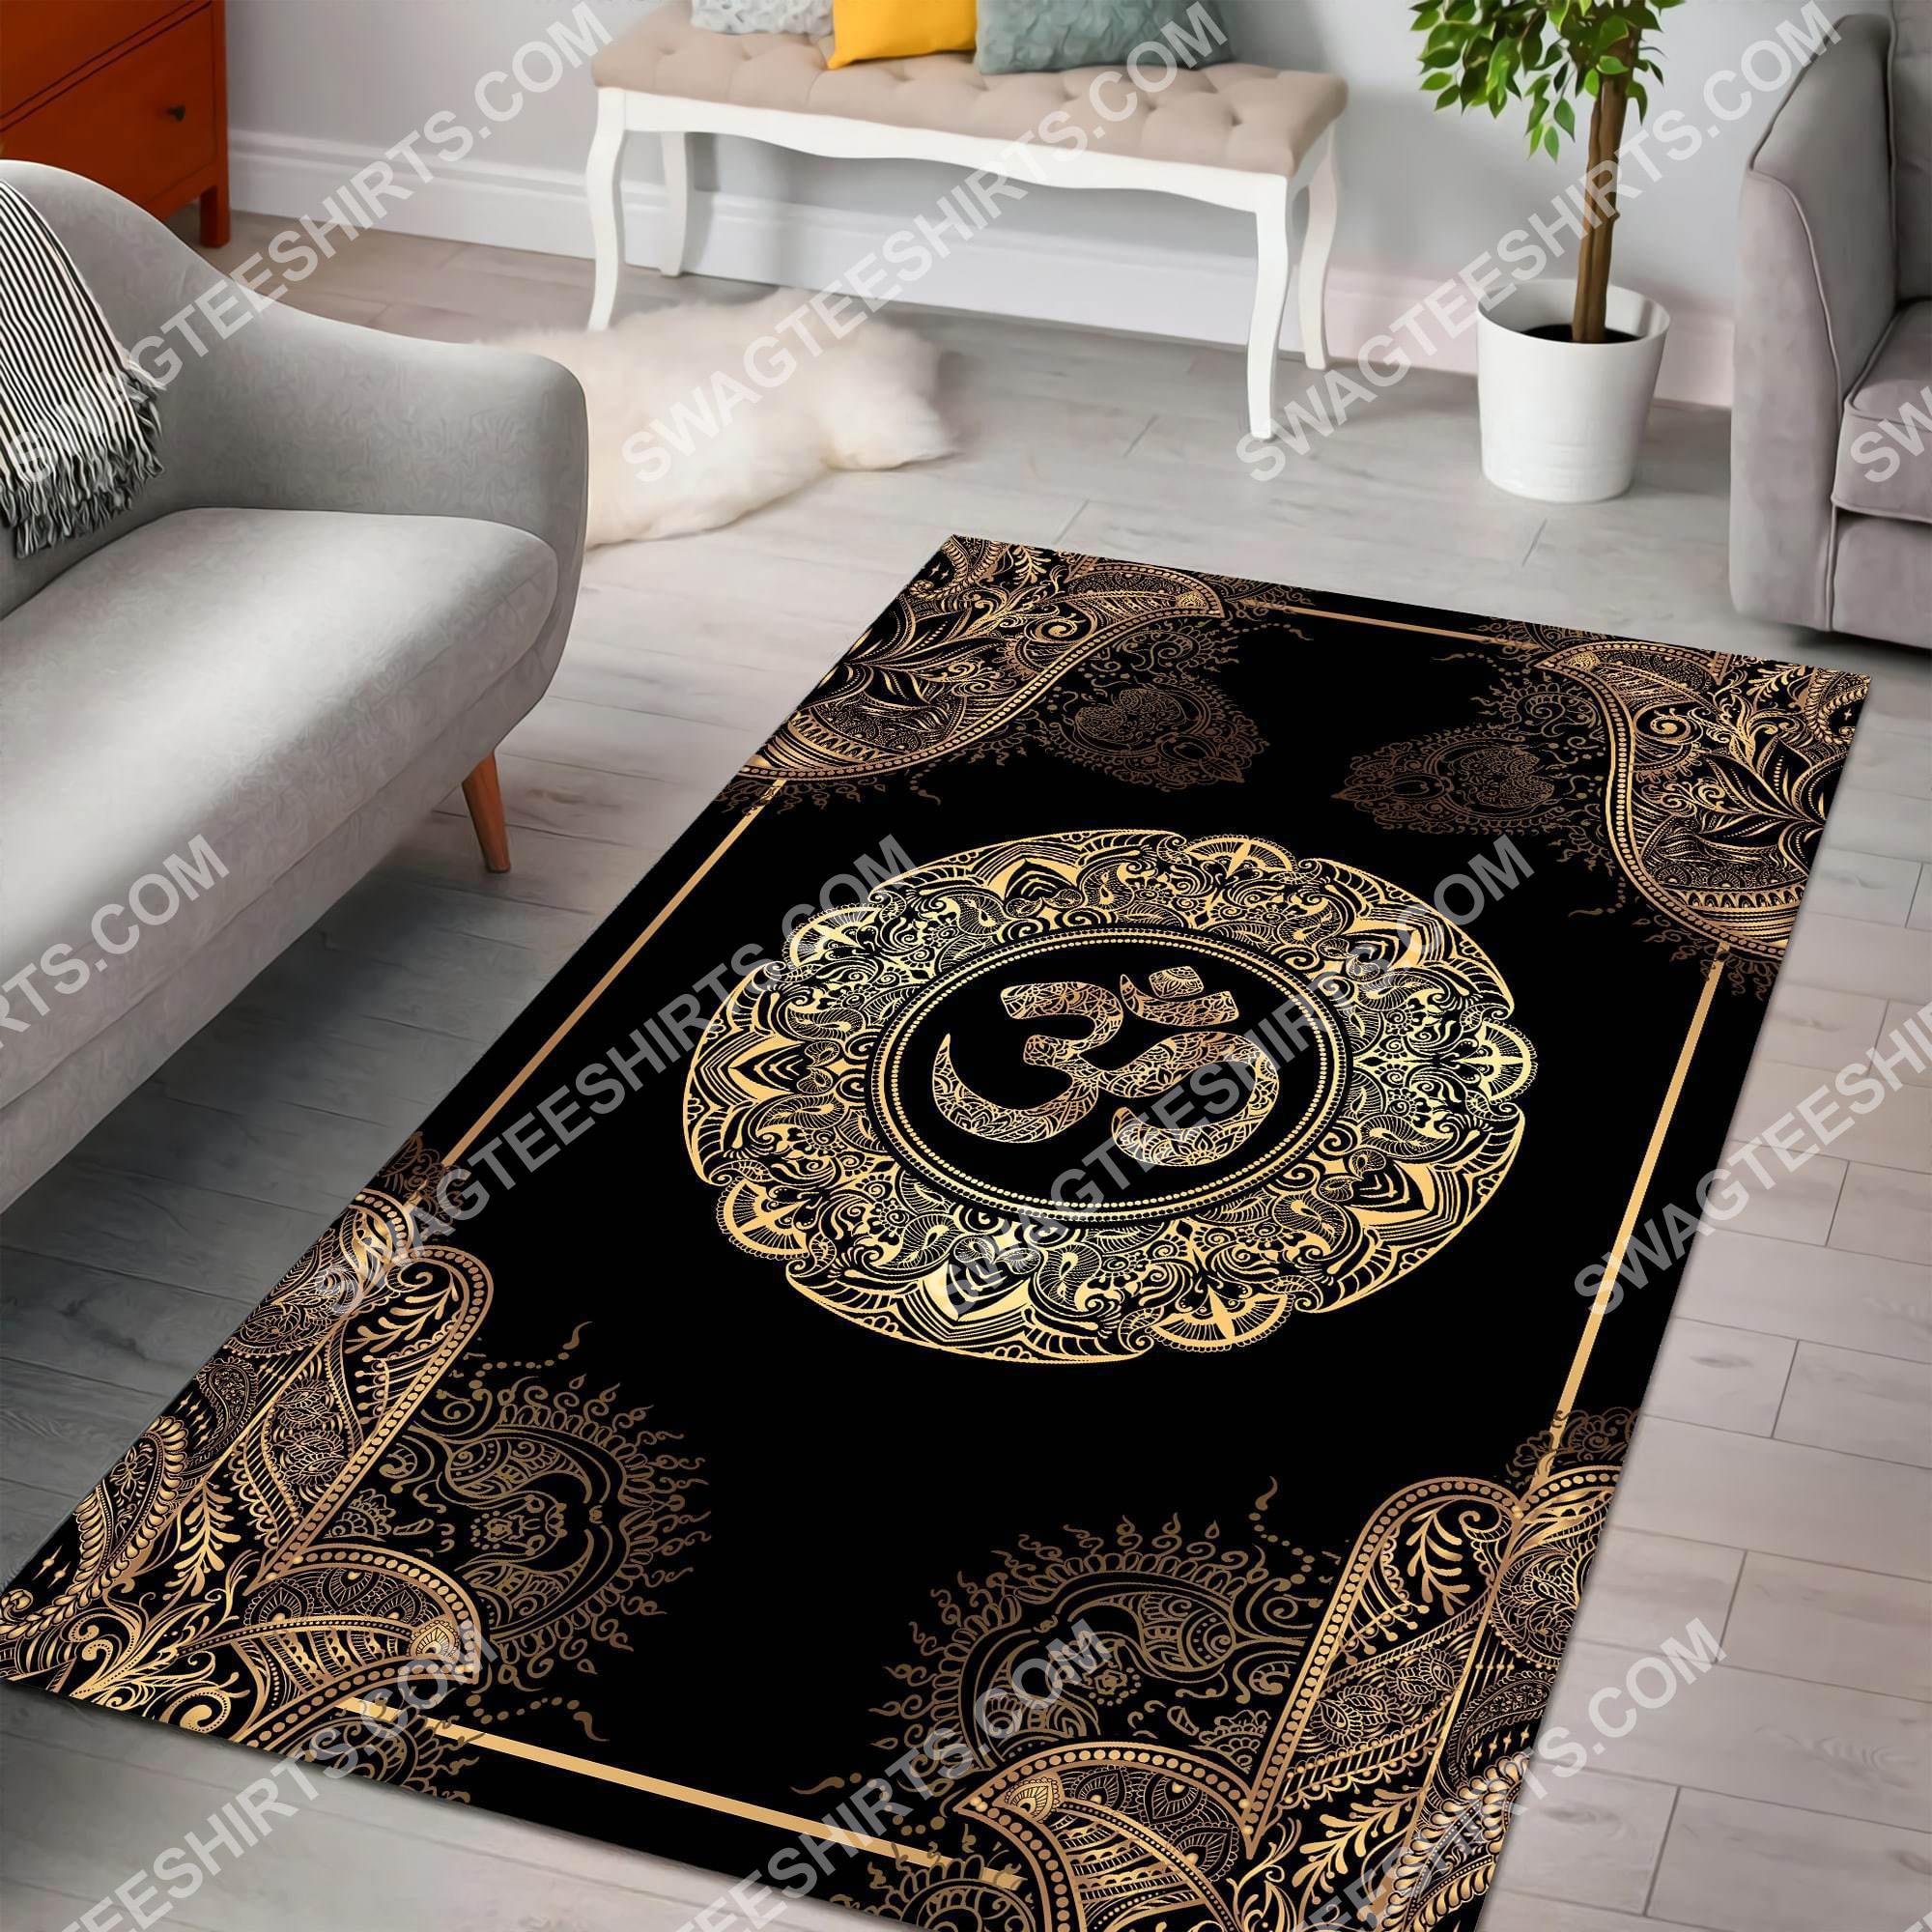 hamsa buddha art pattern all over printed rug 2(1)